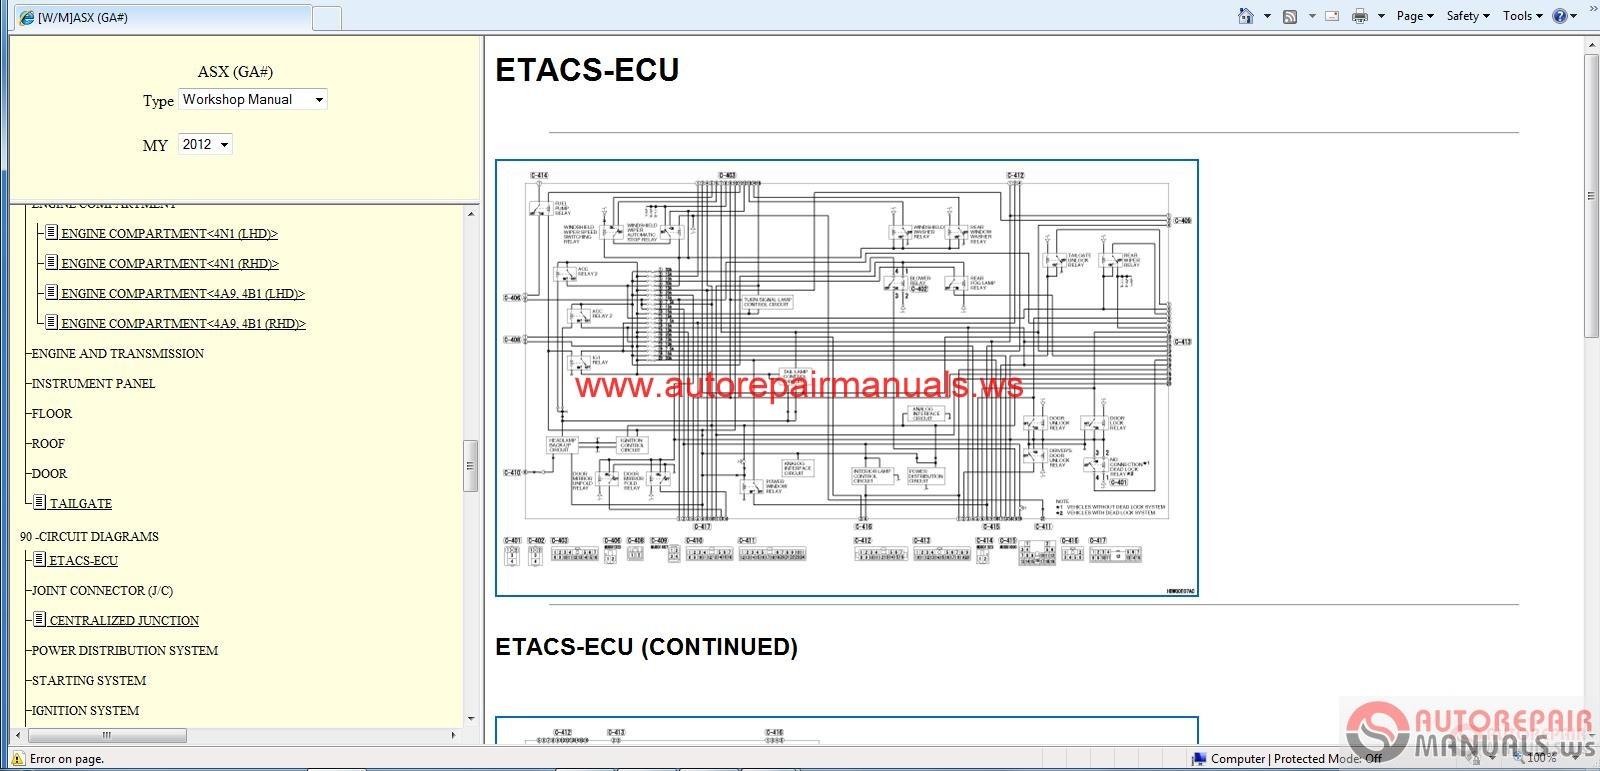 hight resolution of mitsubishi pajero electrical wiring diagram porsche 997 mitsubishi 2 0 diagram mitsubishi 2 0 diagram